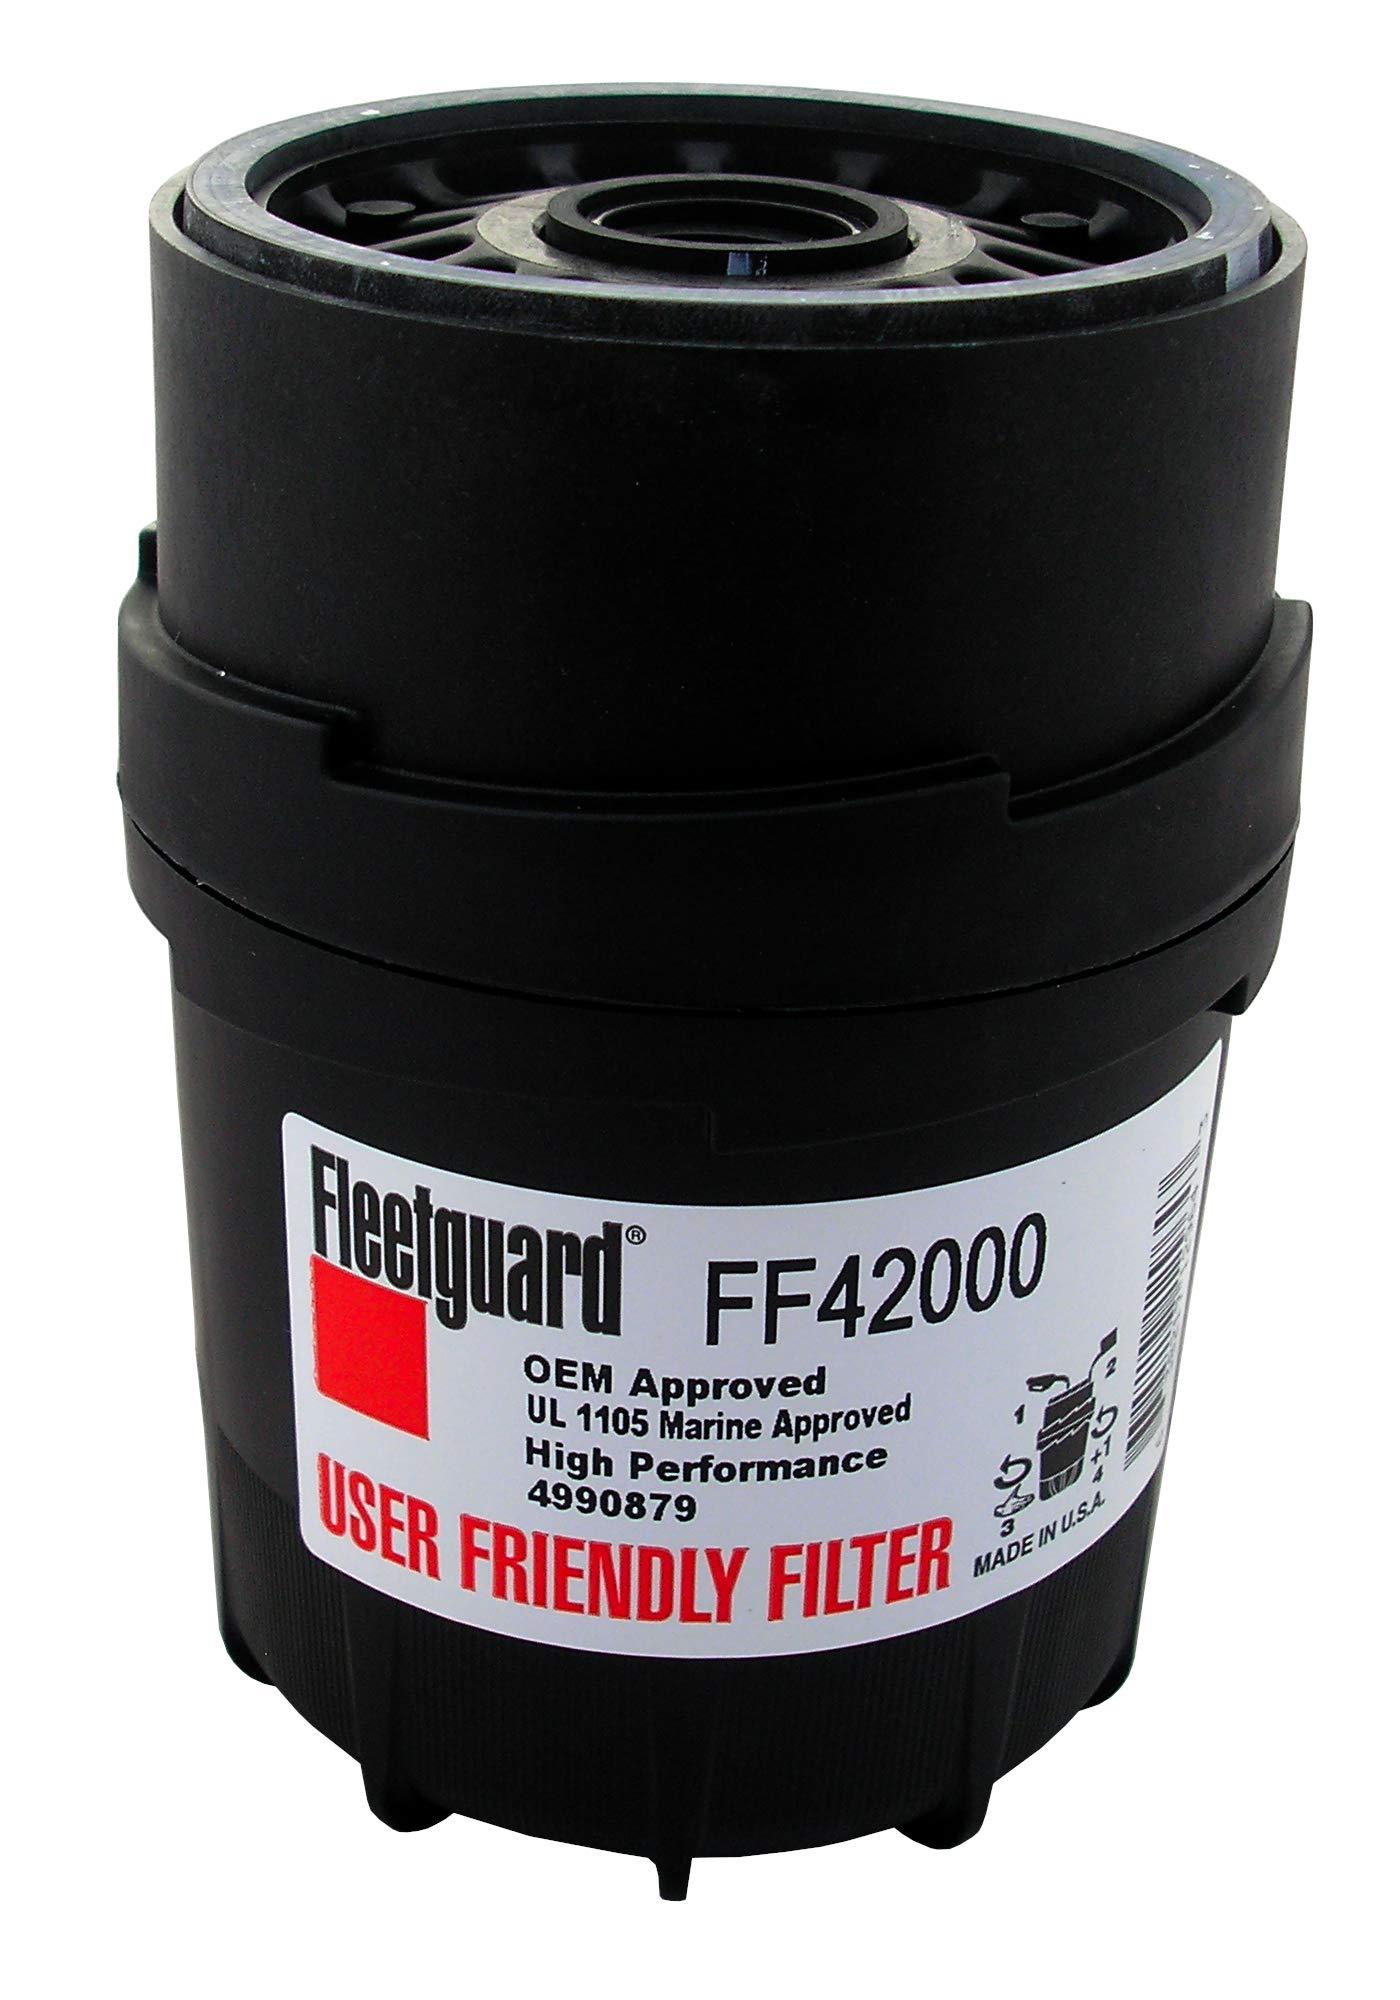 Fleetguard FF42000 Fuel Filter, User Friendly VersioN